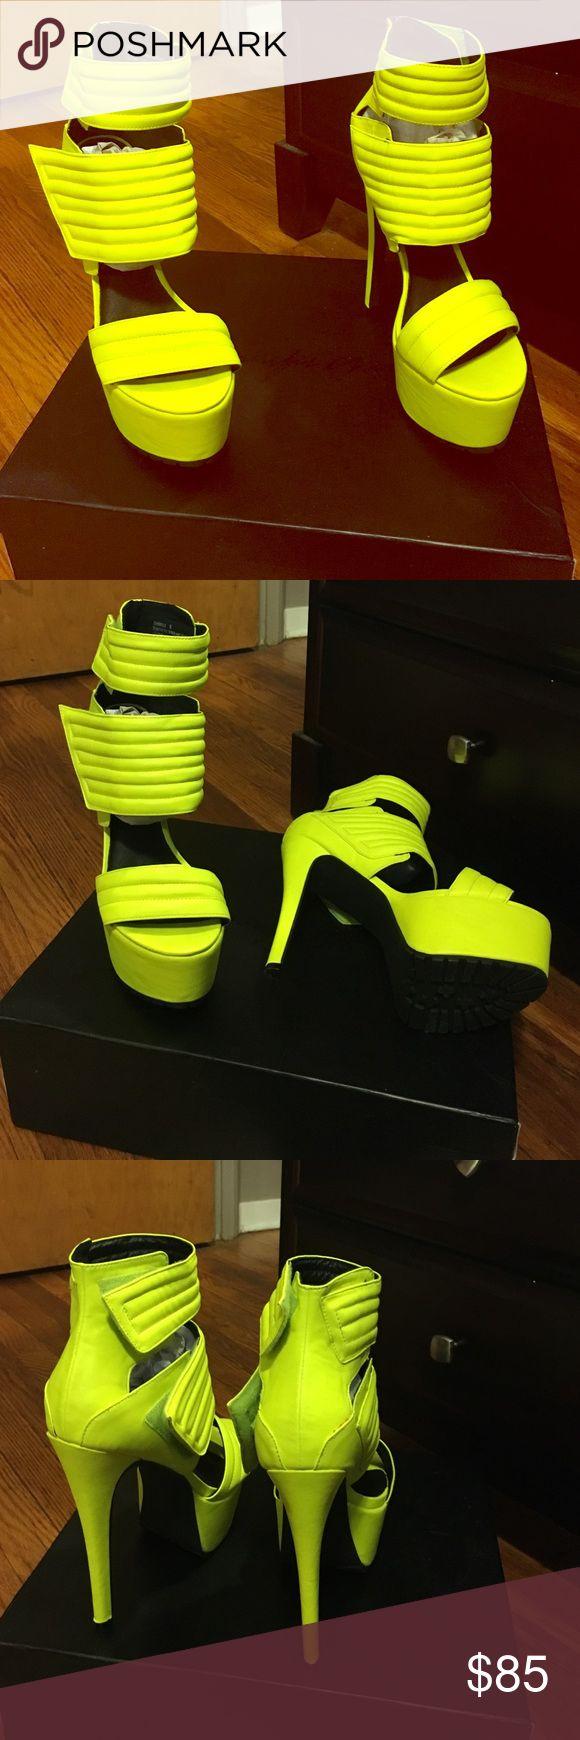 Neon yellow heels Neon yellow high platform heels with Velcro straps Jennifer chou Shoes Platforms